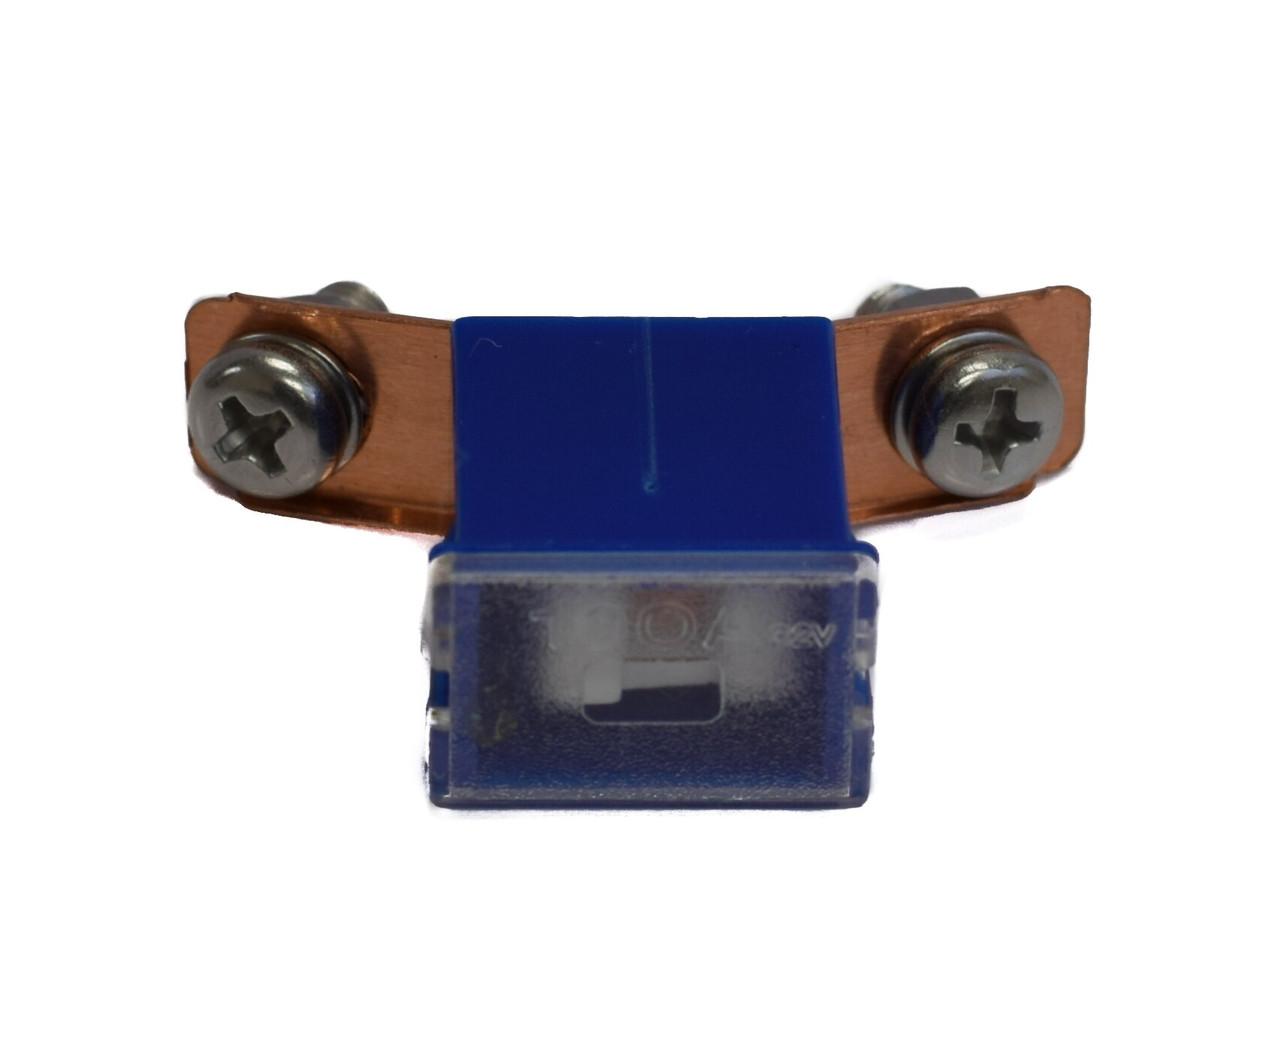 Raion Power RBC7 100A Fuse Includes Nuts & Bolts For APC SU1400NET